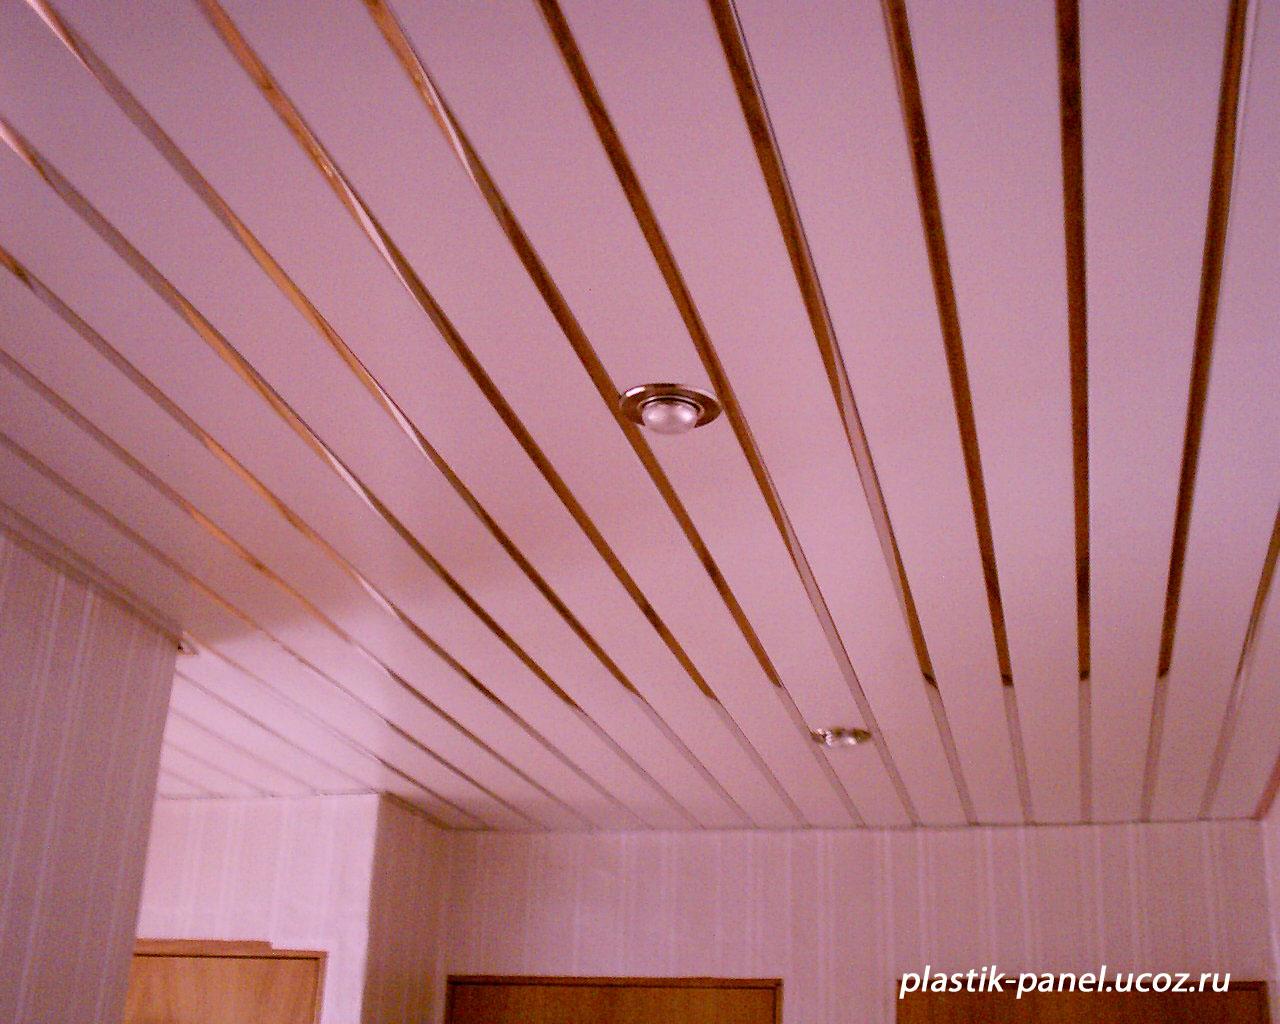 Своими руками панели на потолок фото